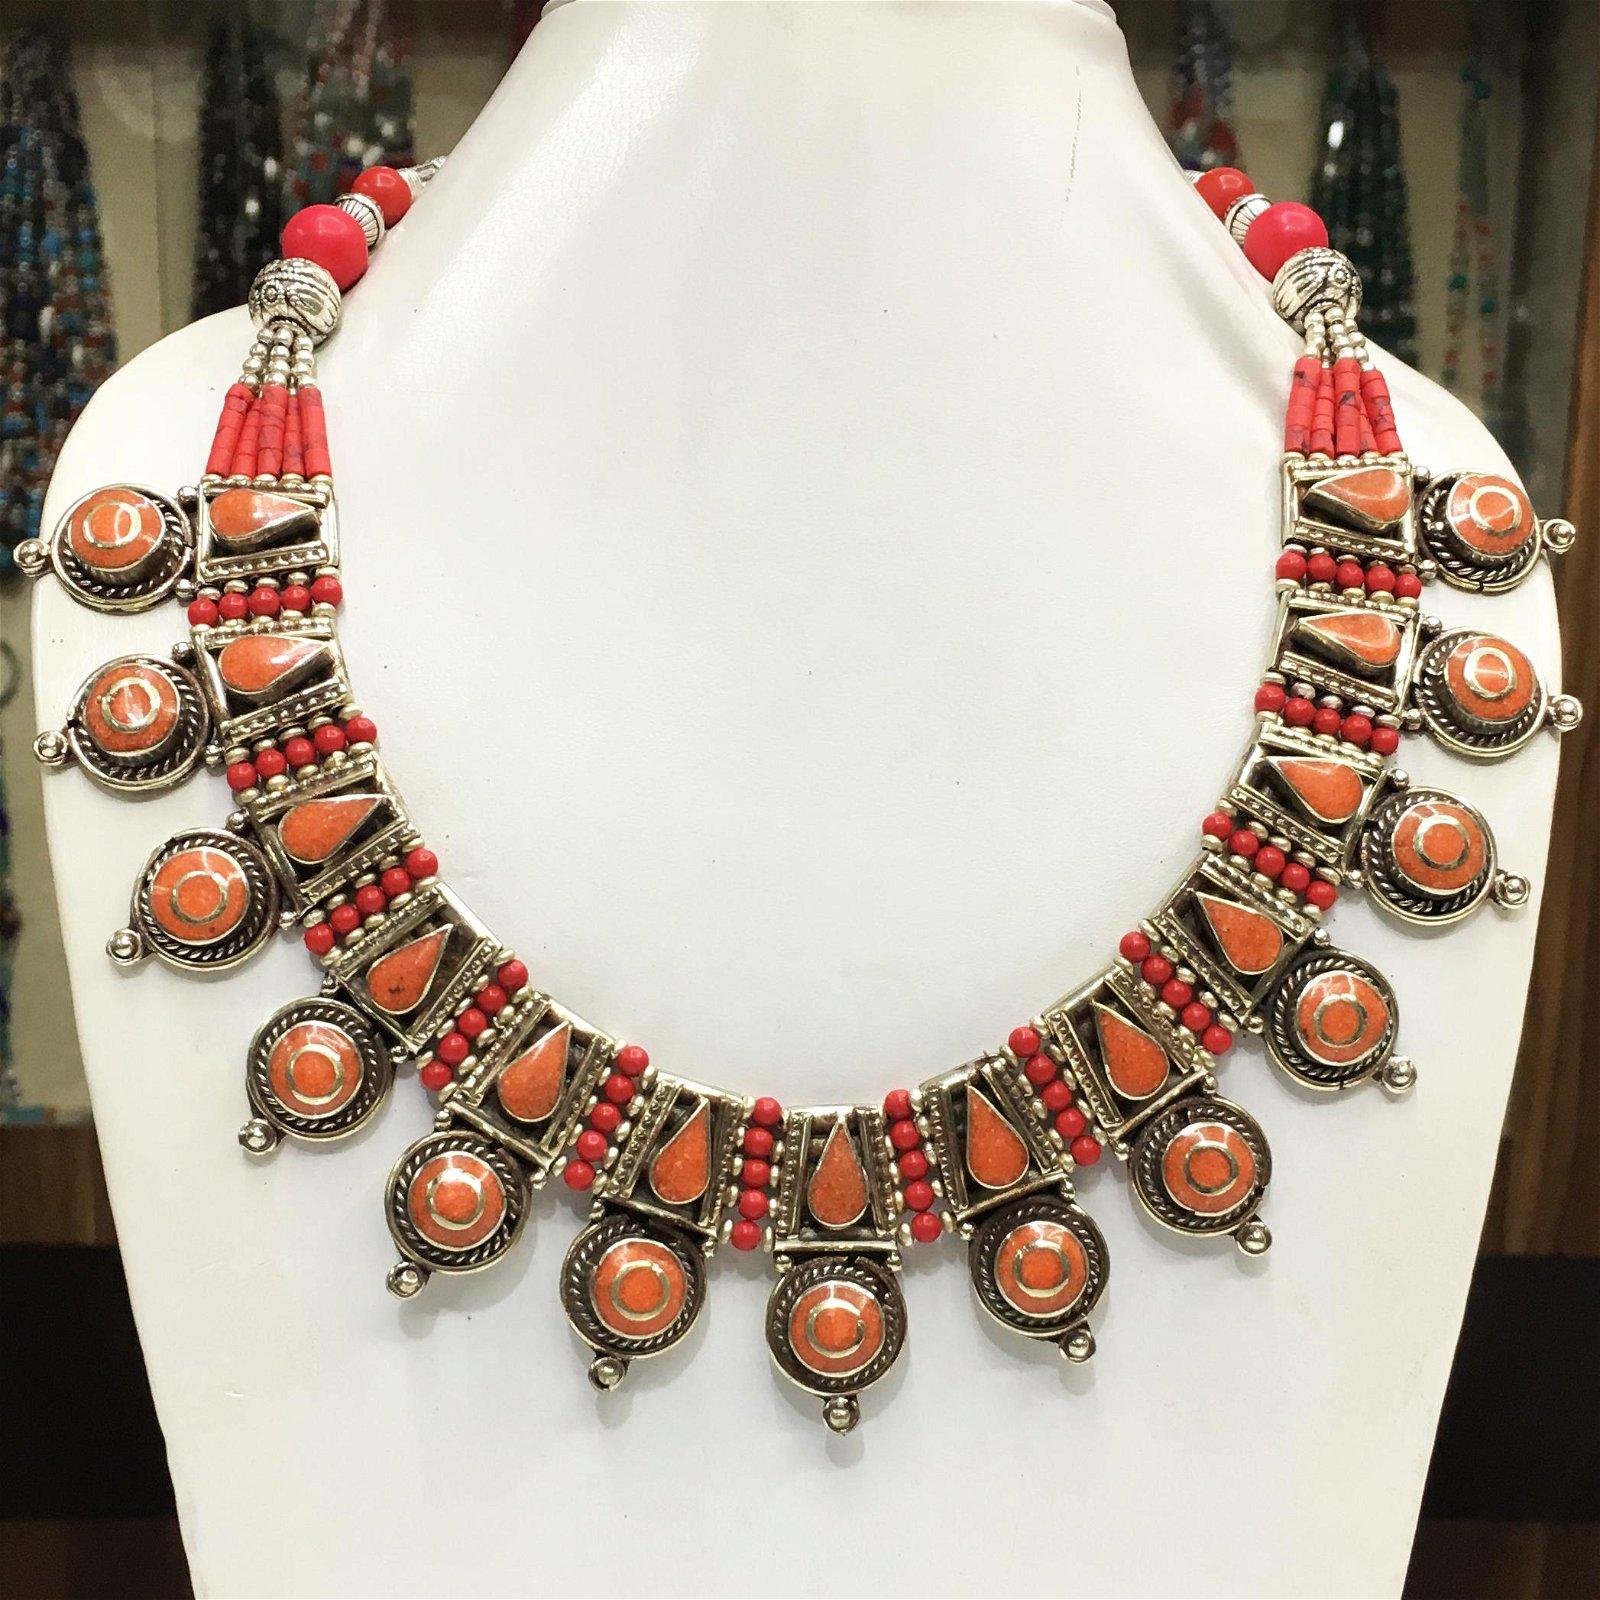 Tibetan Natural Coral Chokar Necklace